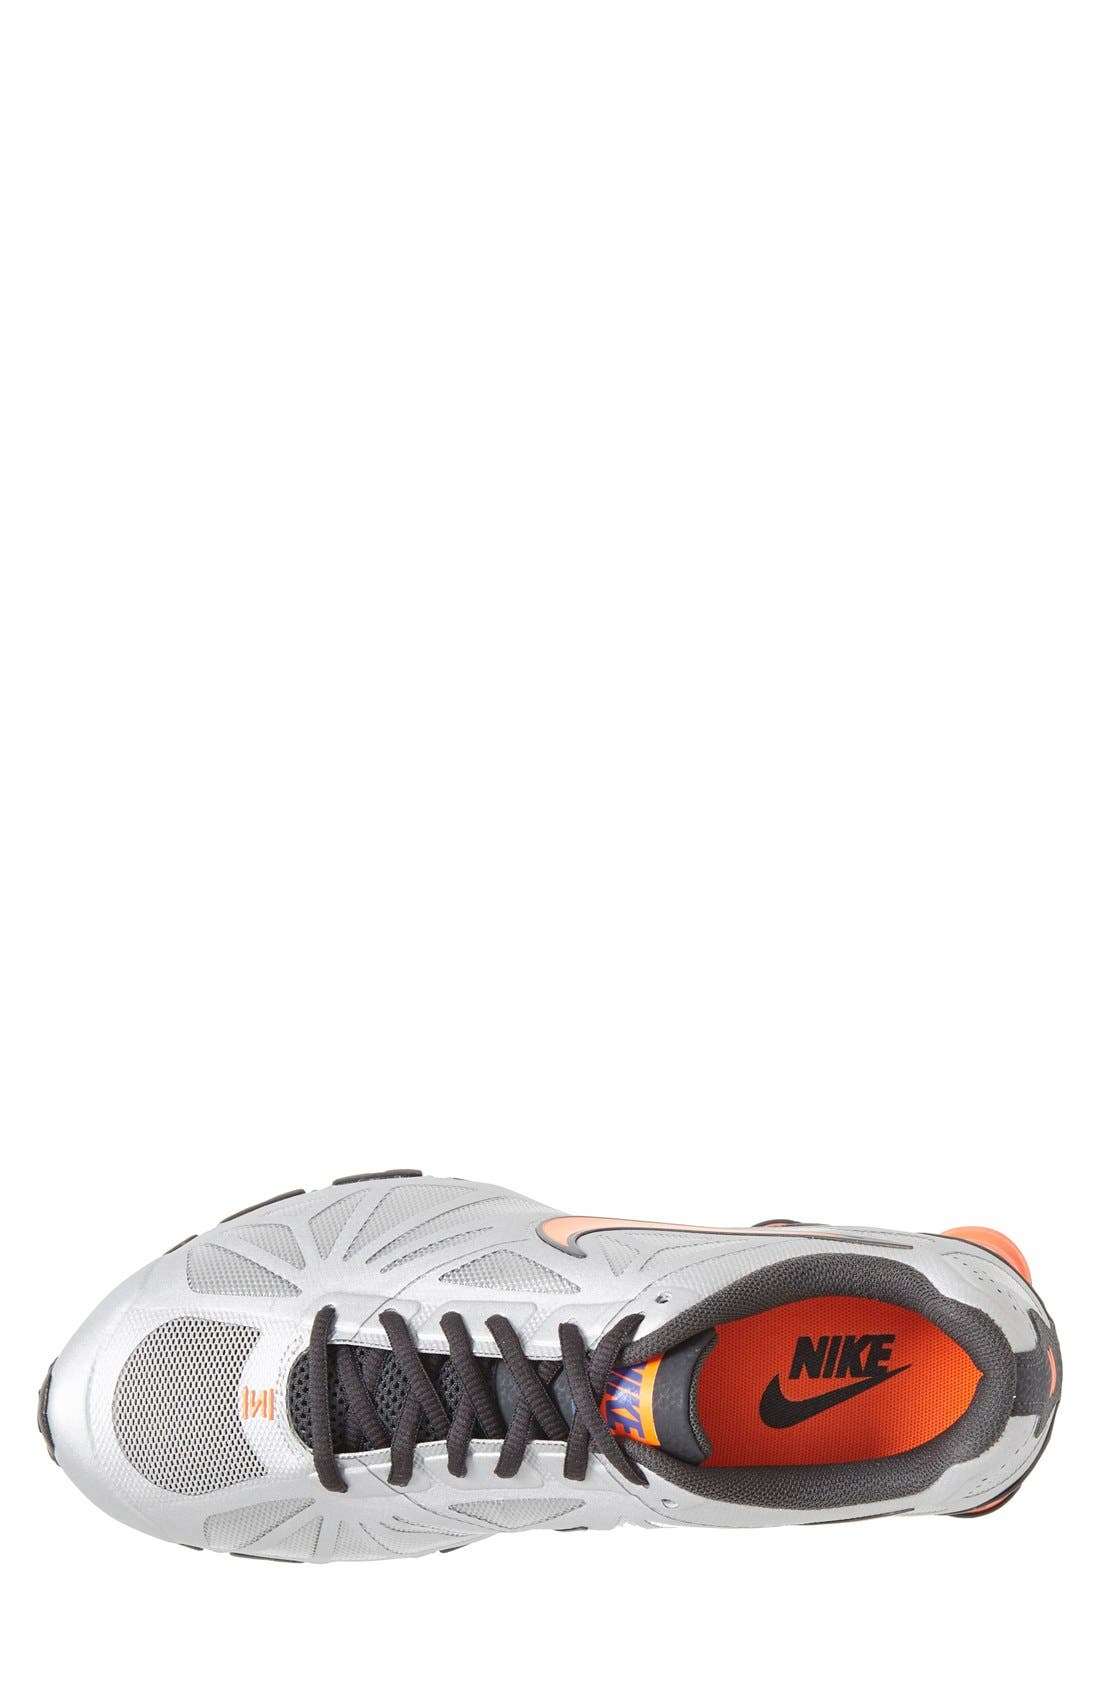 Alternate Image 3  - Nike 'Shox Turbo 14' Running Shoe (Men)